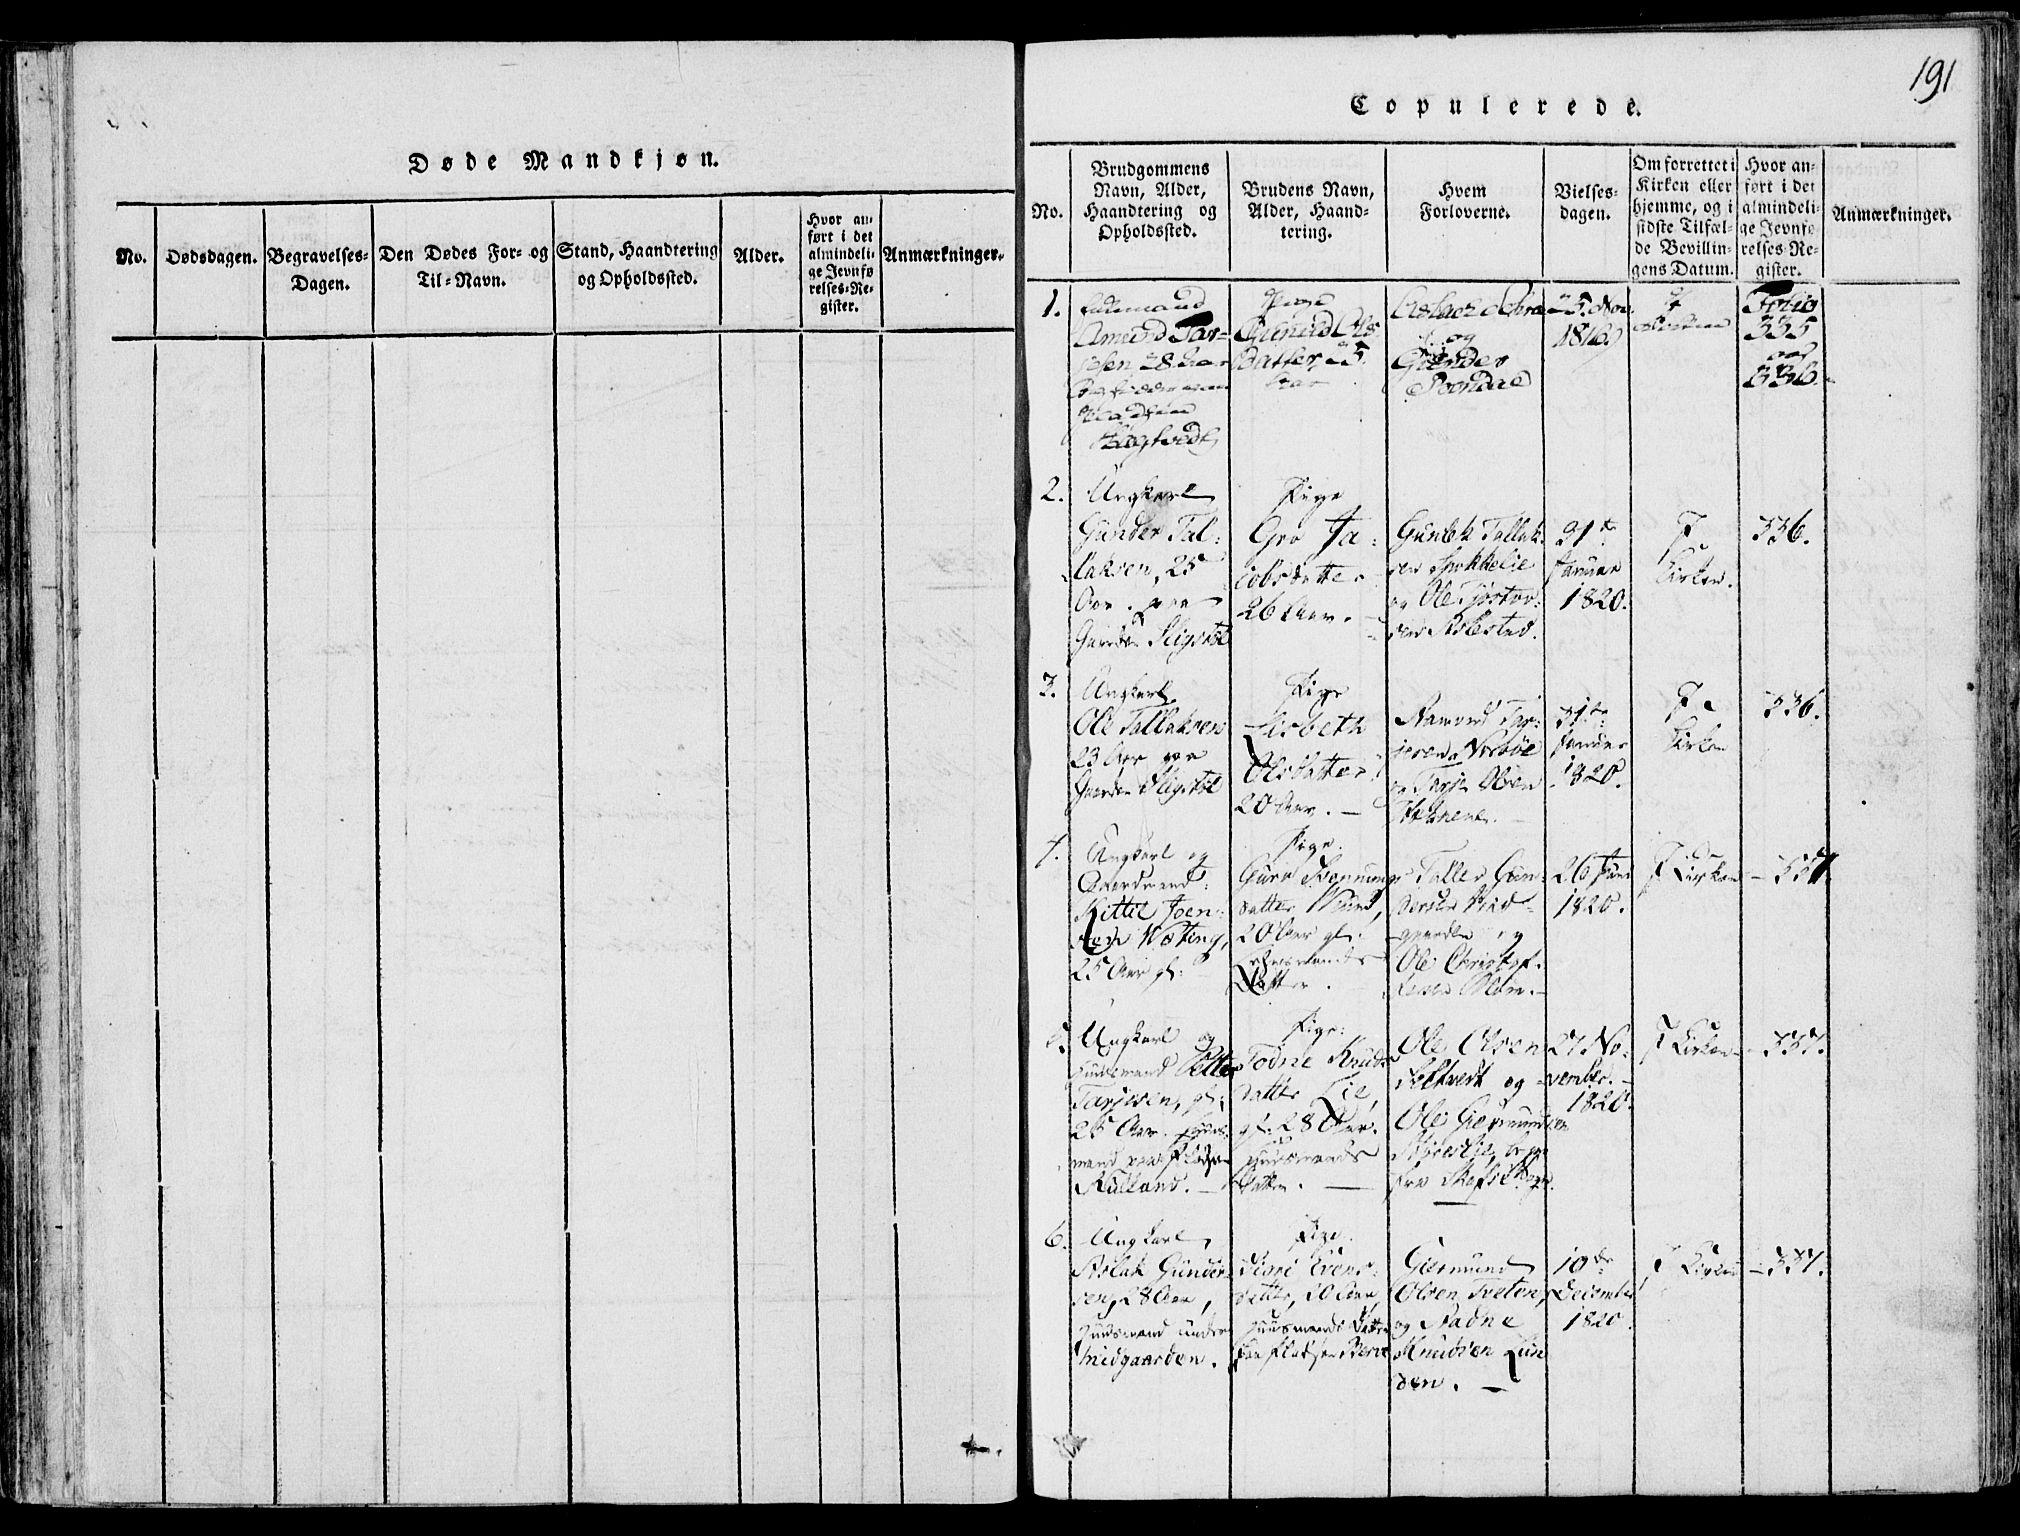 SAKO, Fyresdal kirkebøker, F/Fb/L0001: Ministerialbok nr. II 1, 1815-1854, s. 191